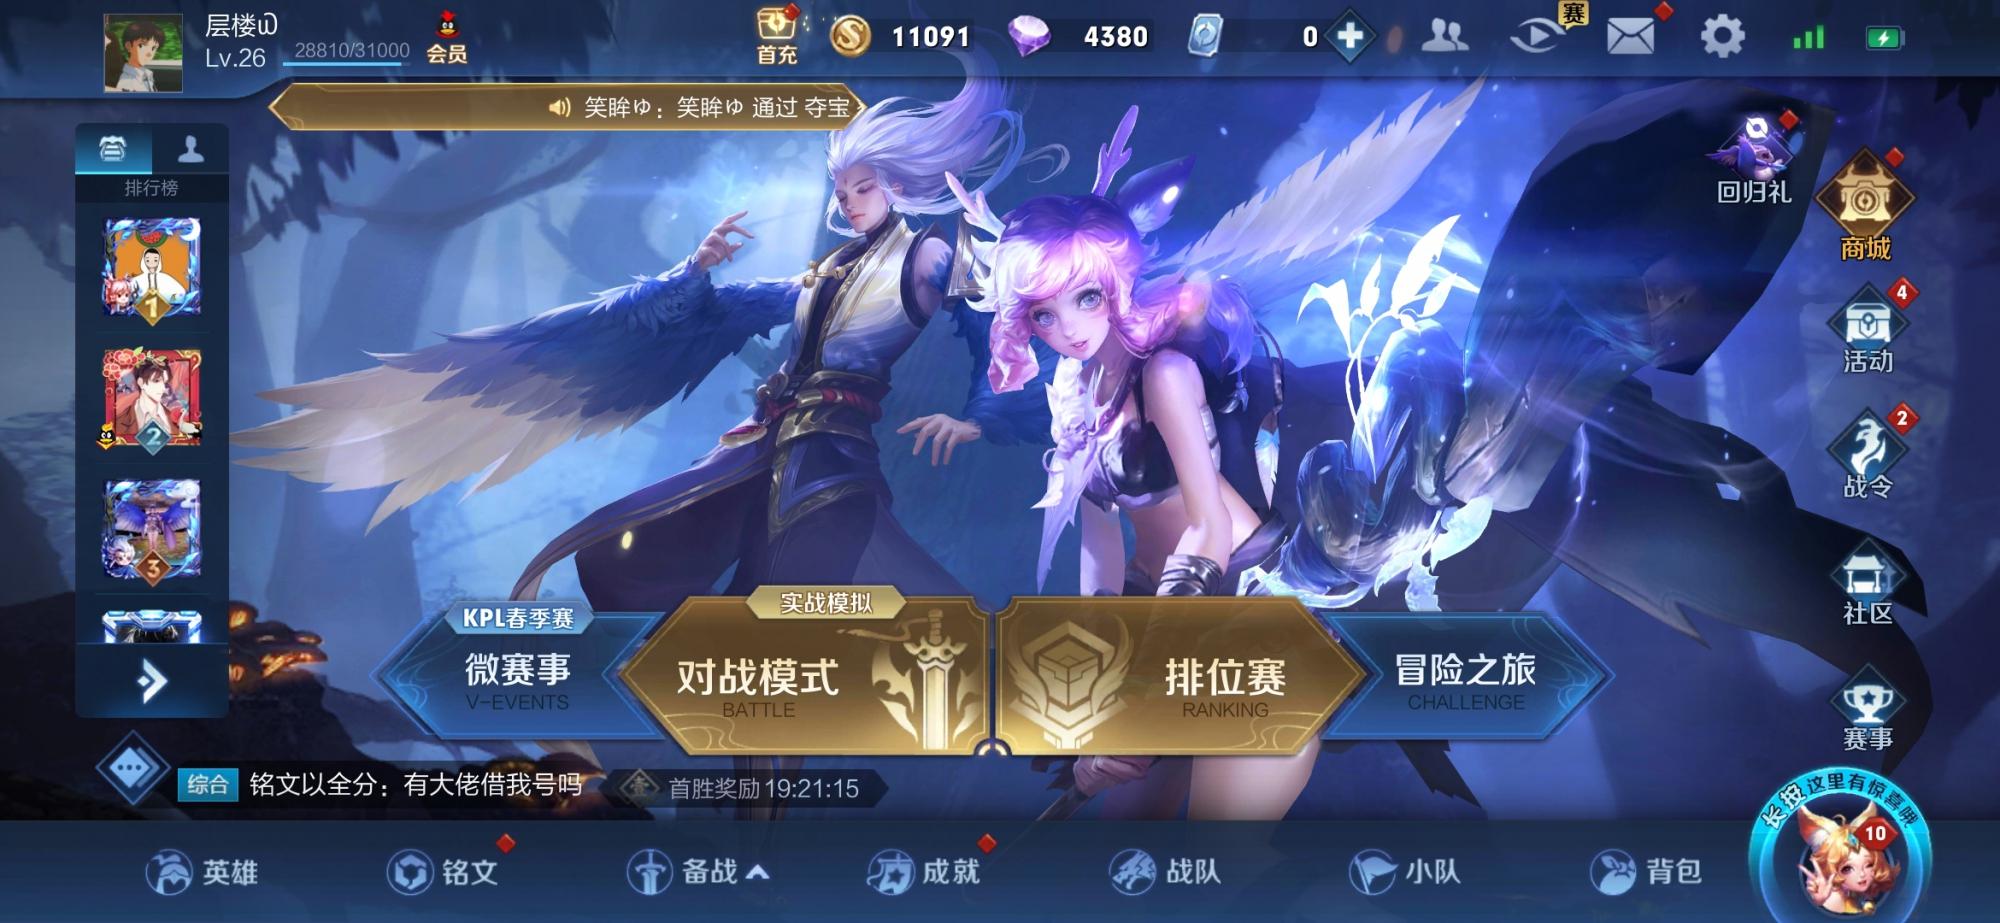 Screenshot_20190530_224322_com.tencent.tmgp.sgame.jpg